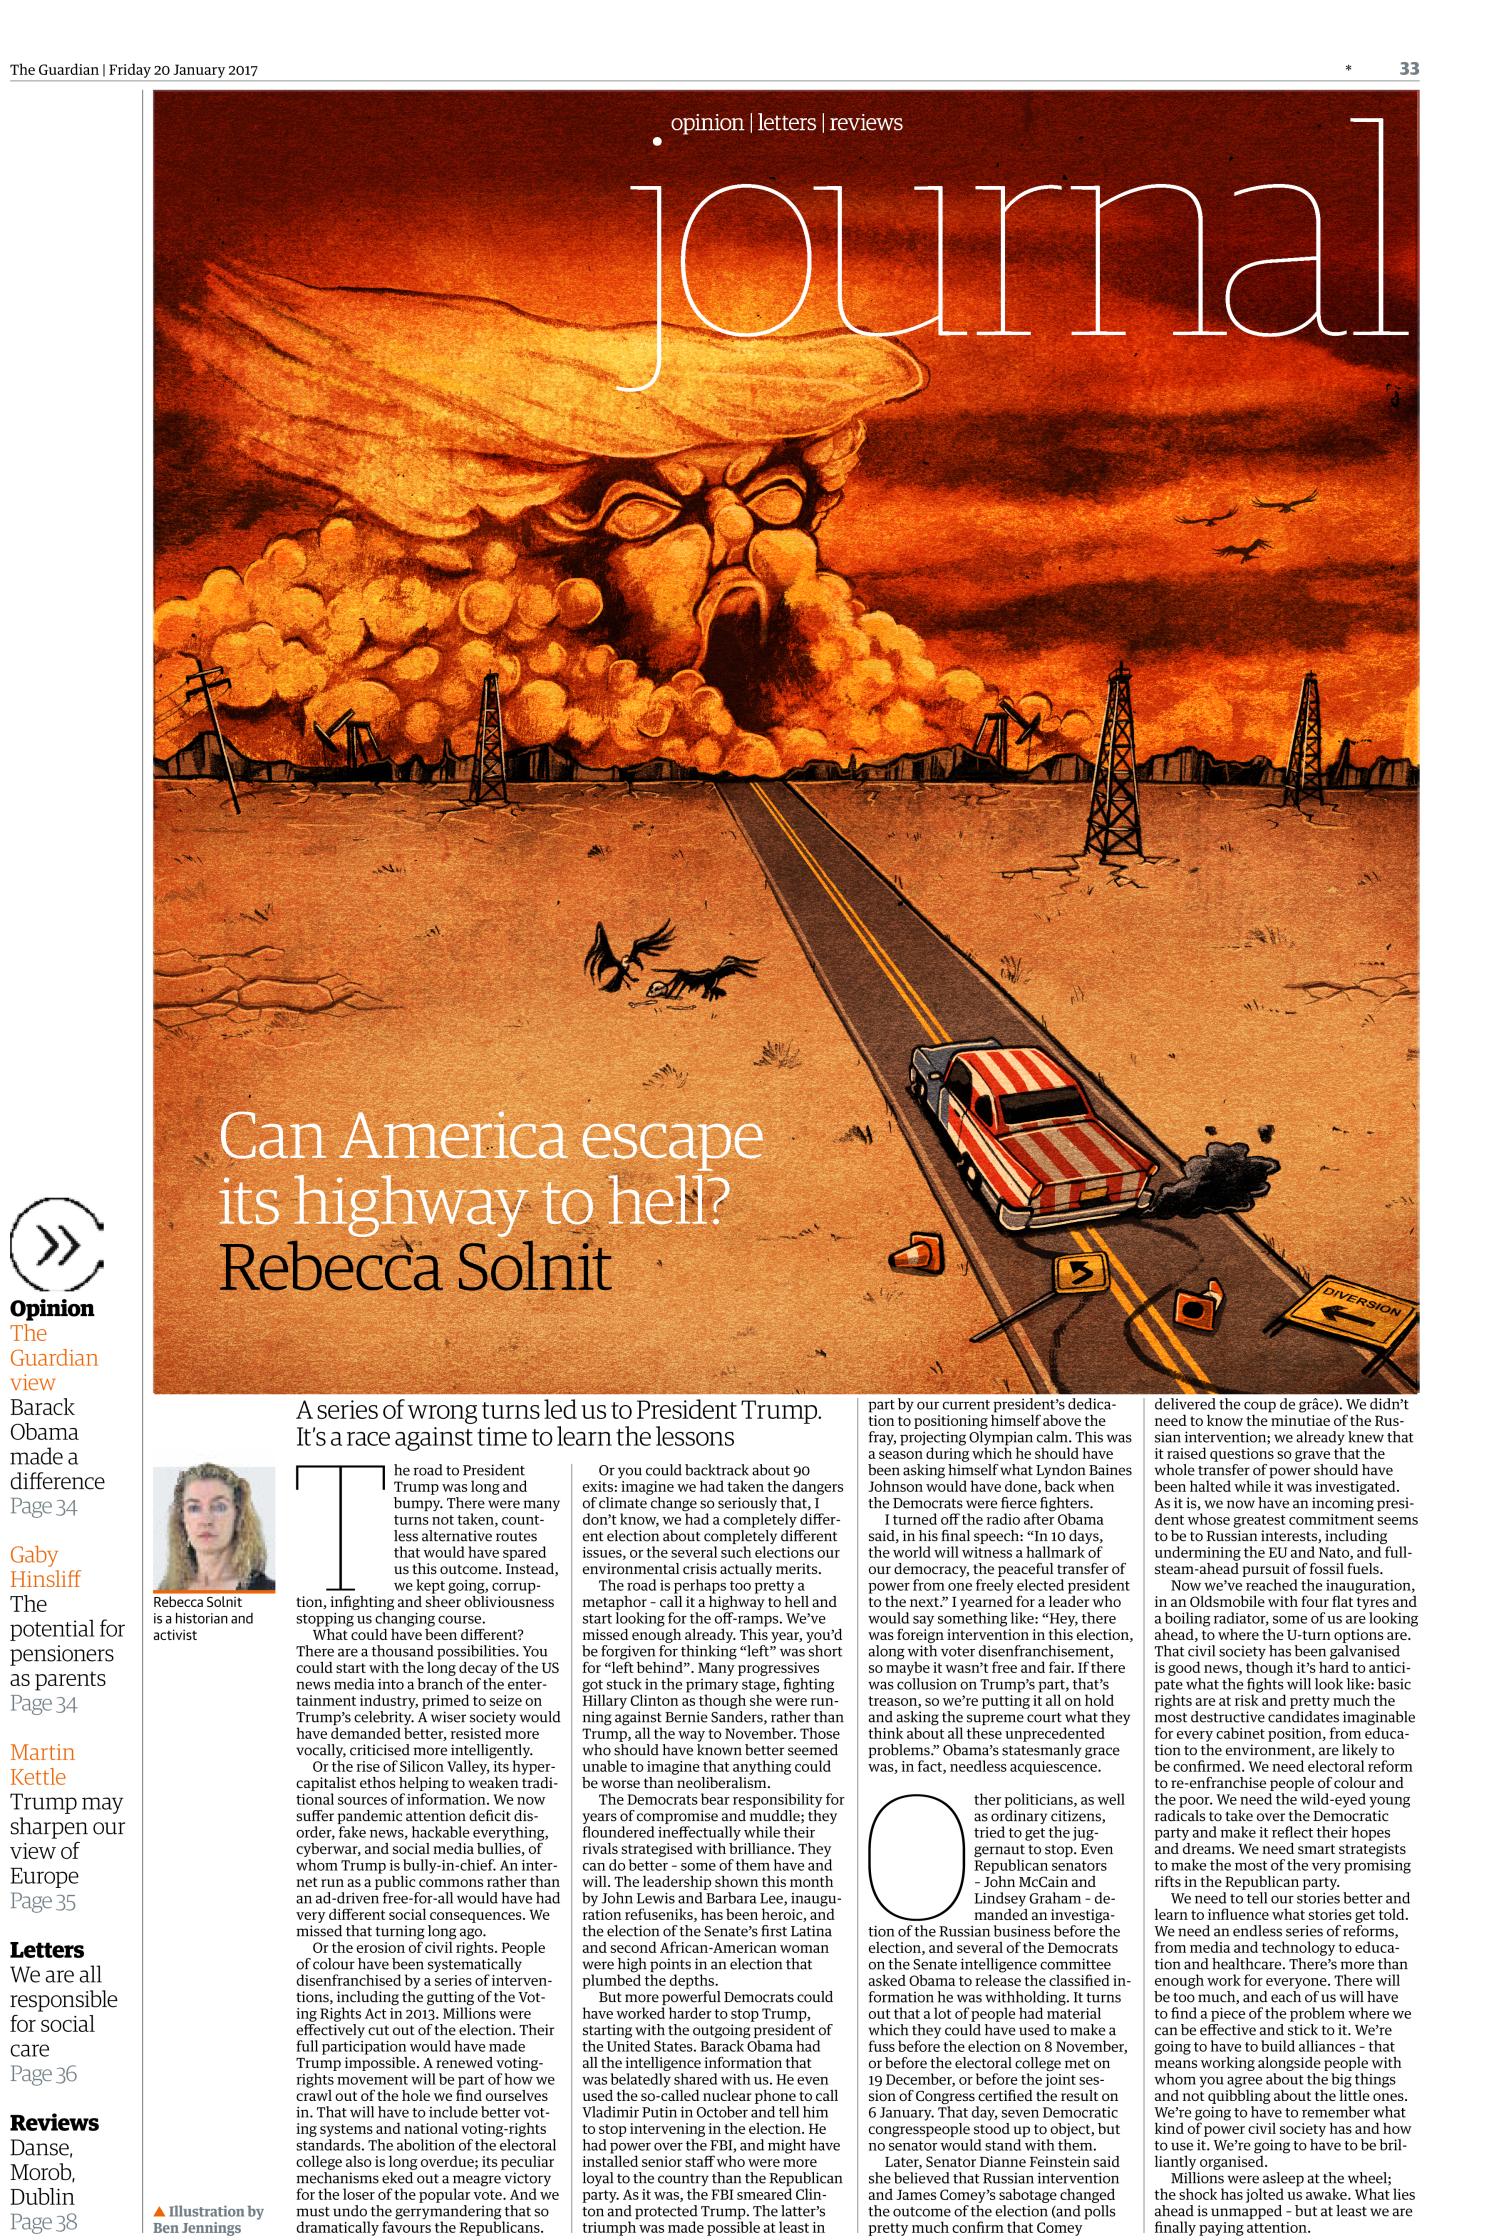 The Guardian - 20.01.17.jpg